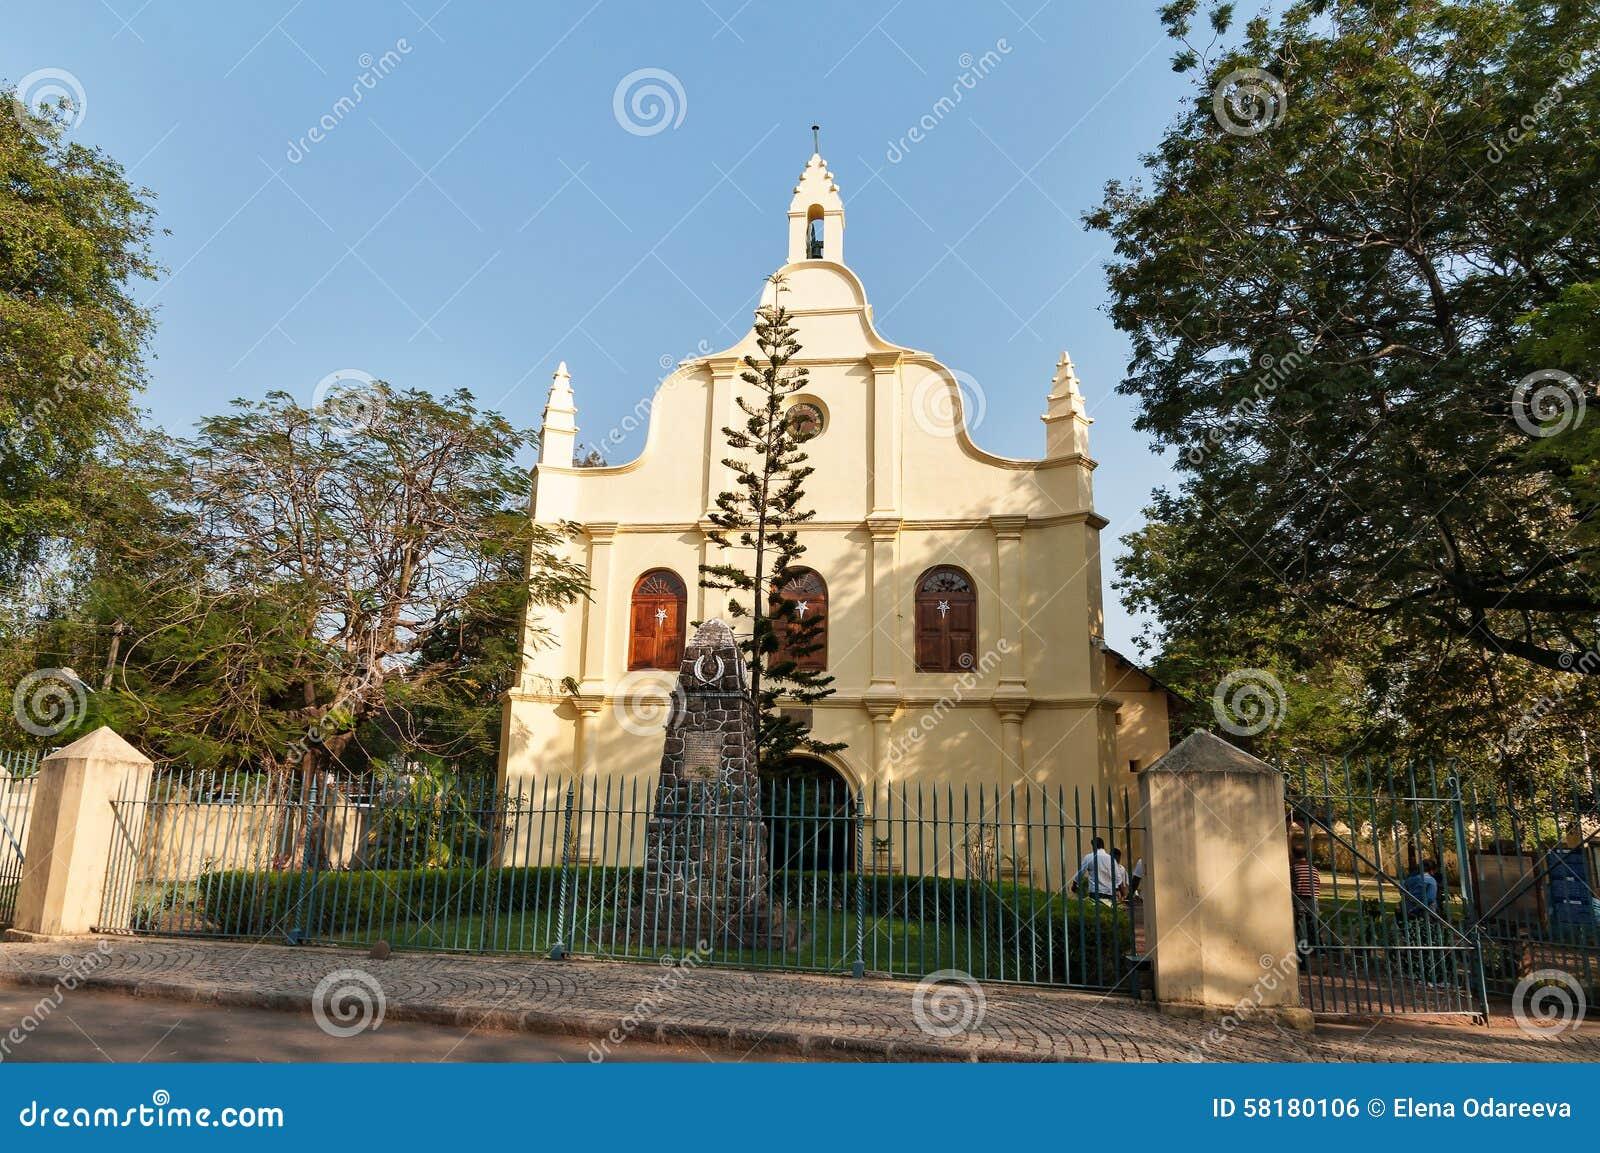 St. Francis Church in Fort Kochi